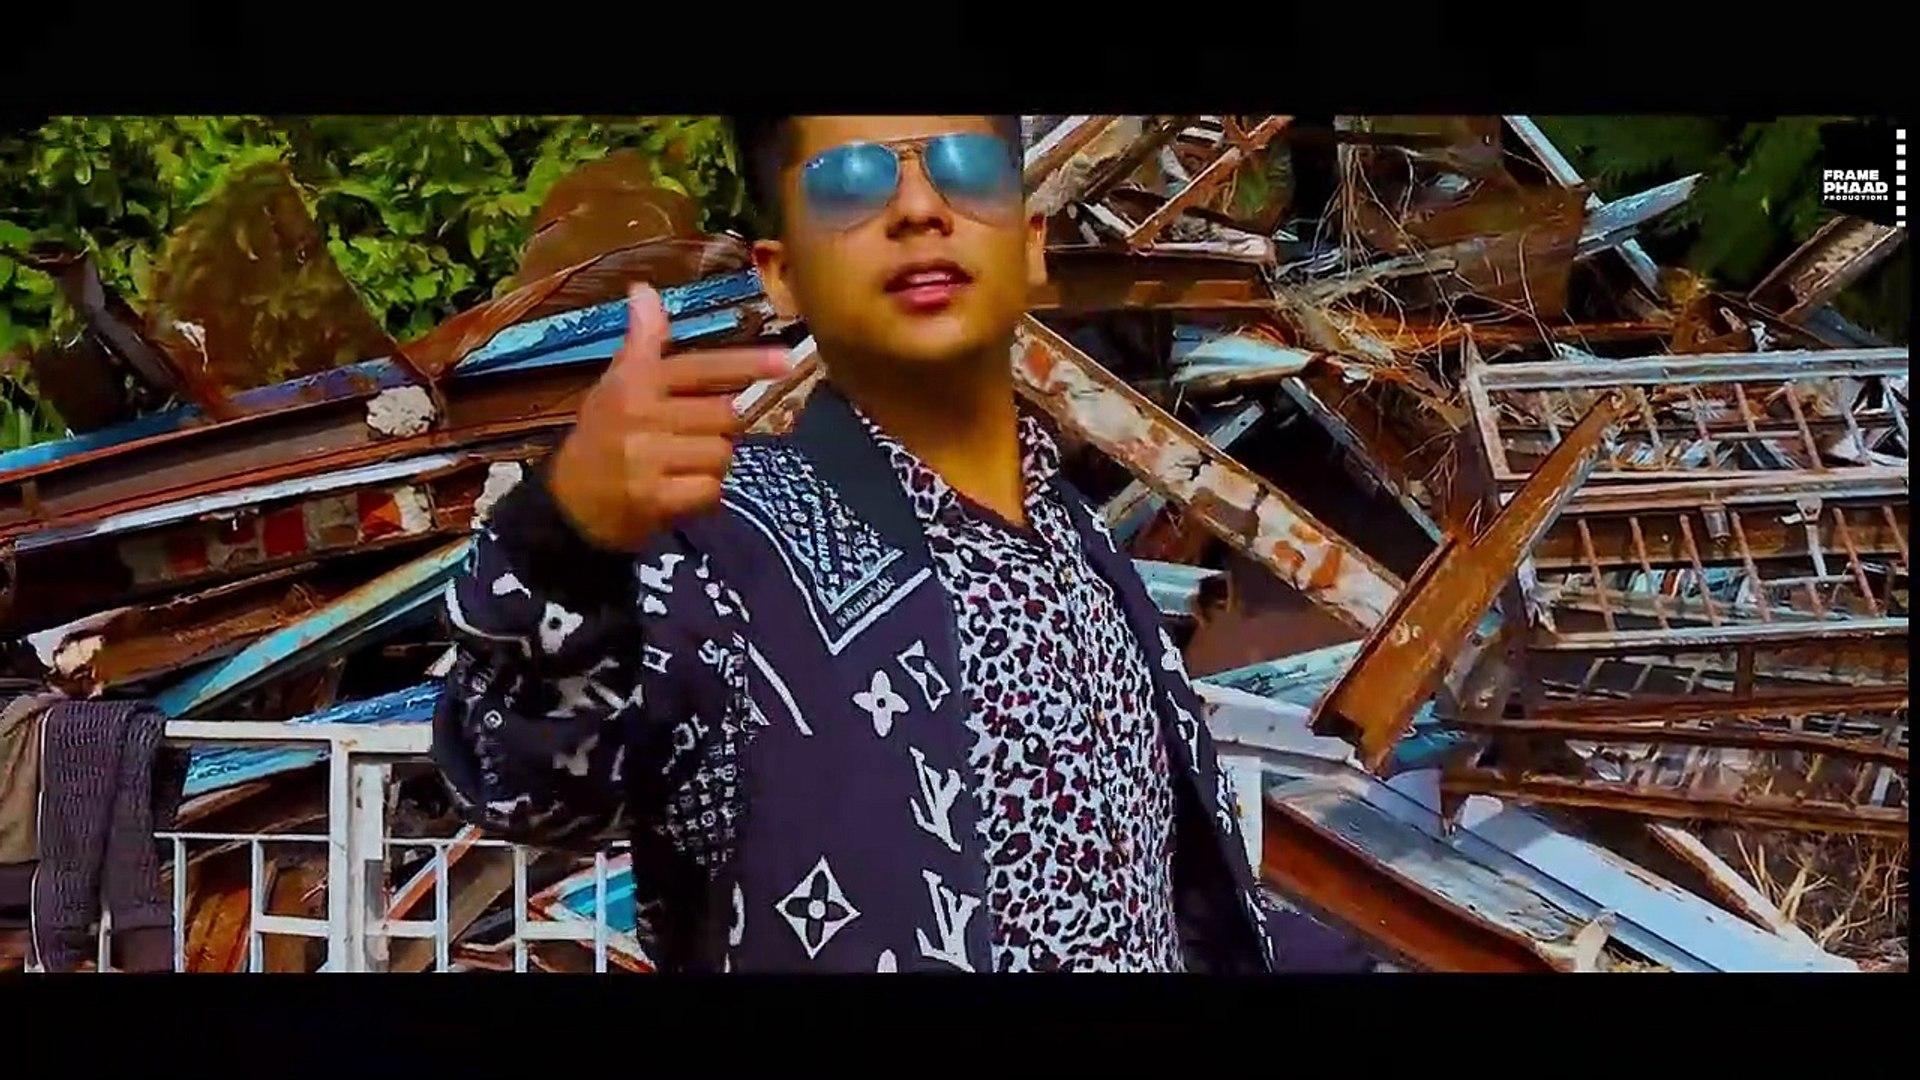 New_Punjabi_Song_2021_|_Gangland_-_Dau_Slathia_|_Latest_Punjabi_Song_2021_|_T-Series